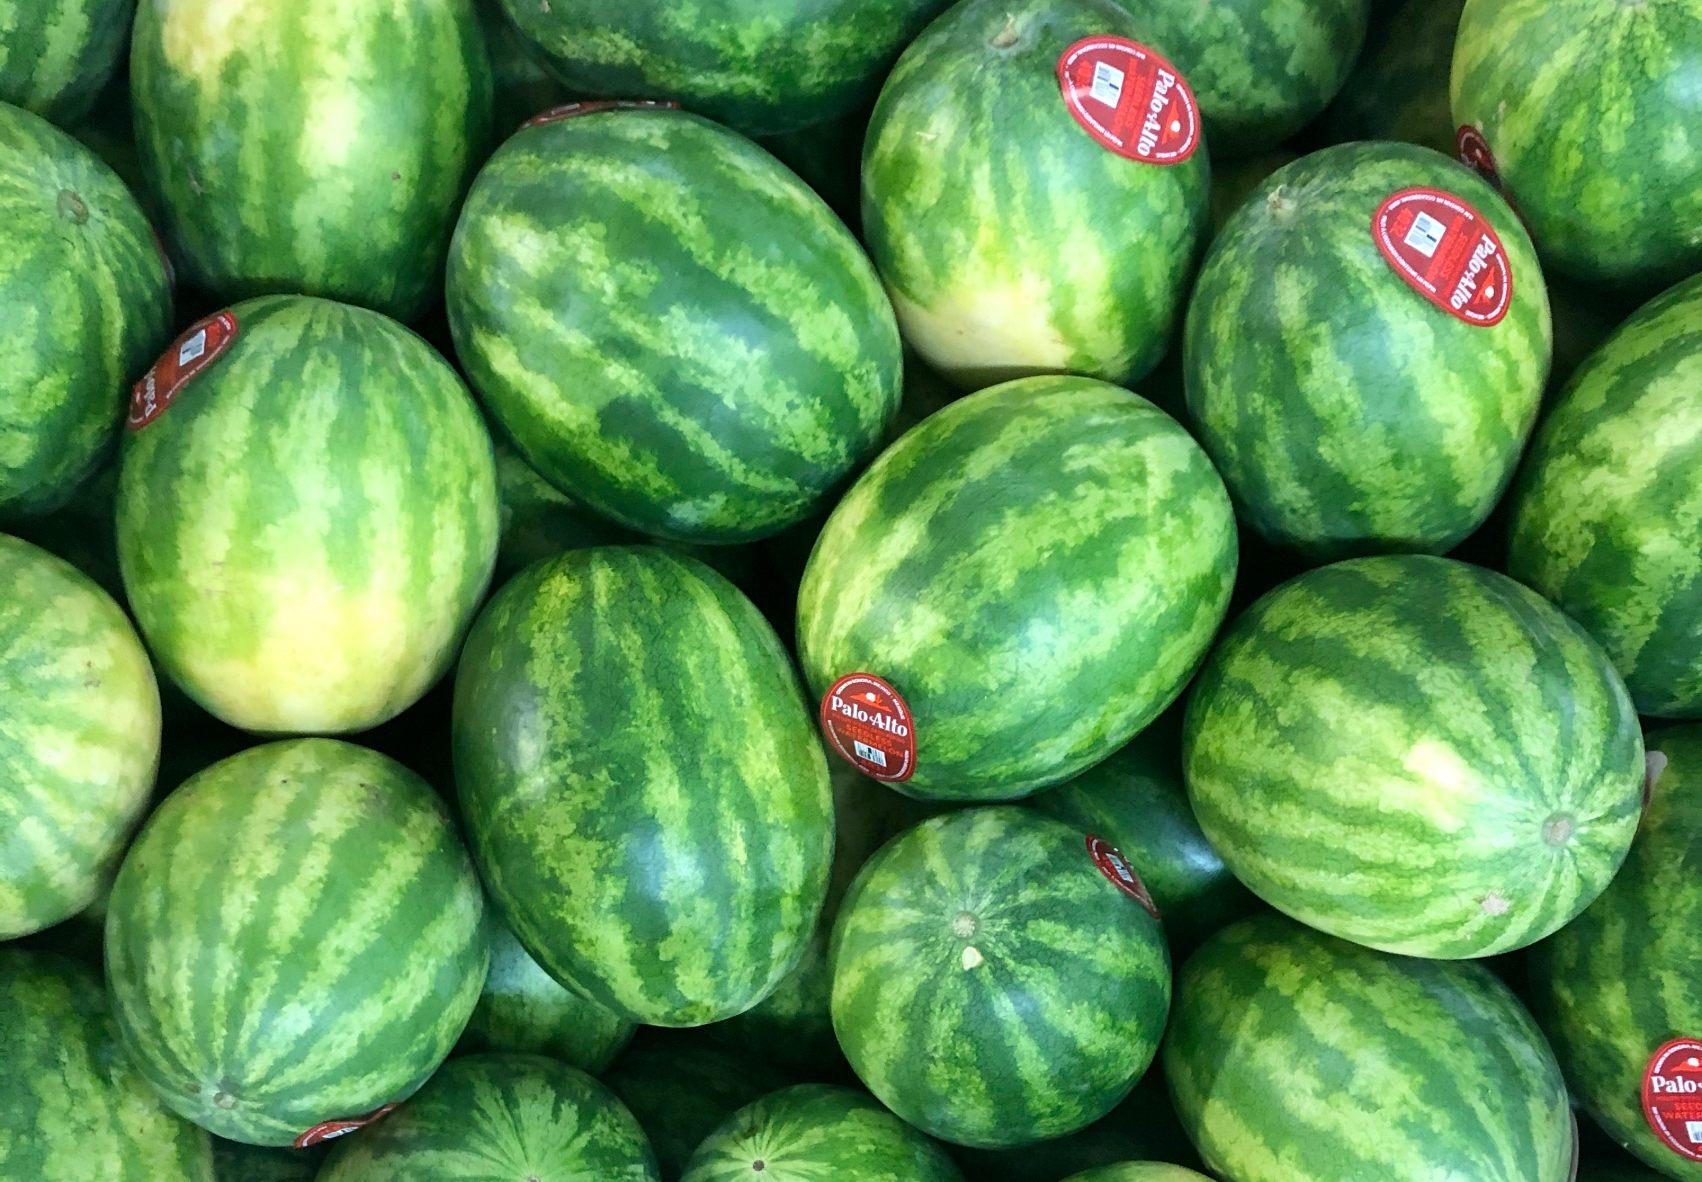 watermelon bin